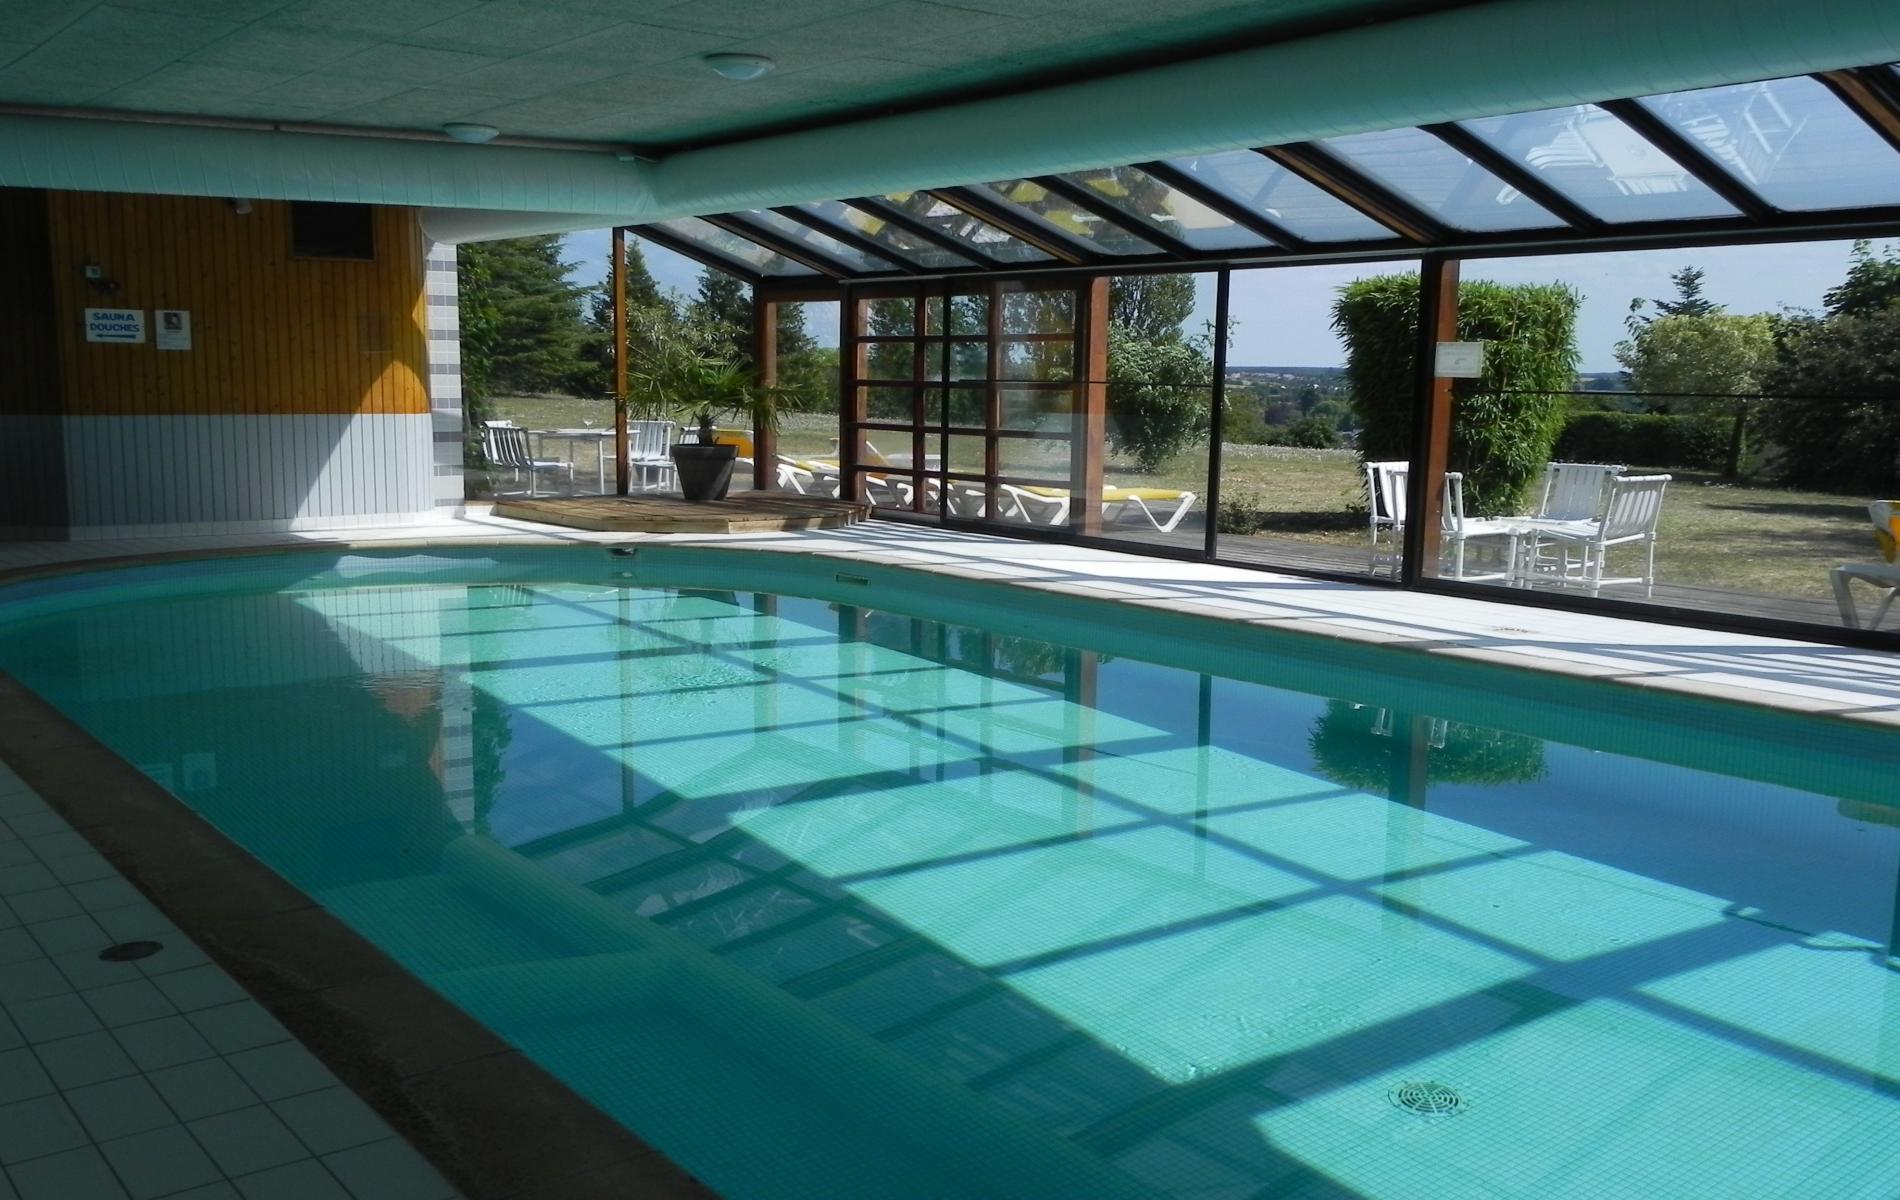 piscine couverte hotel luccotel loches